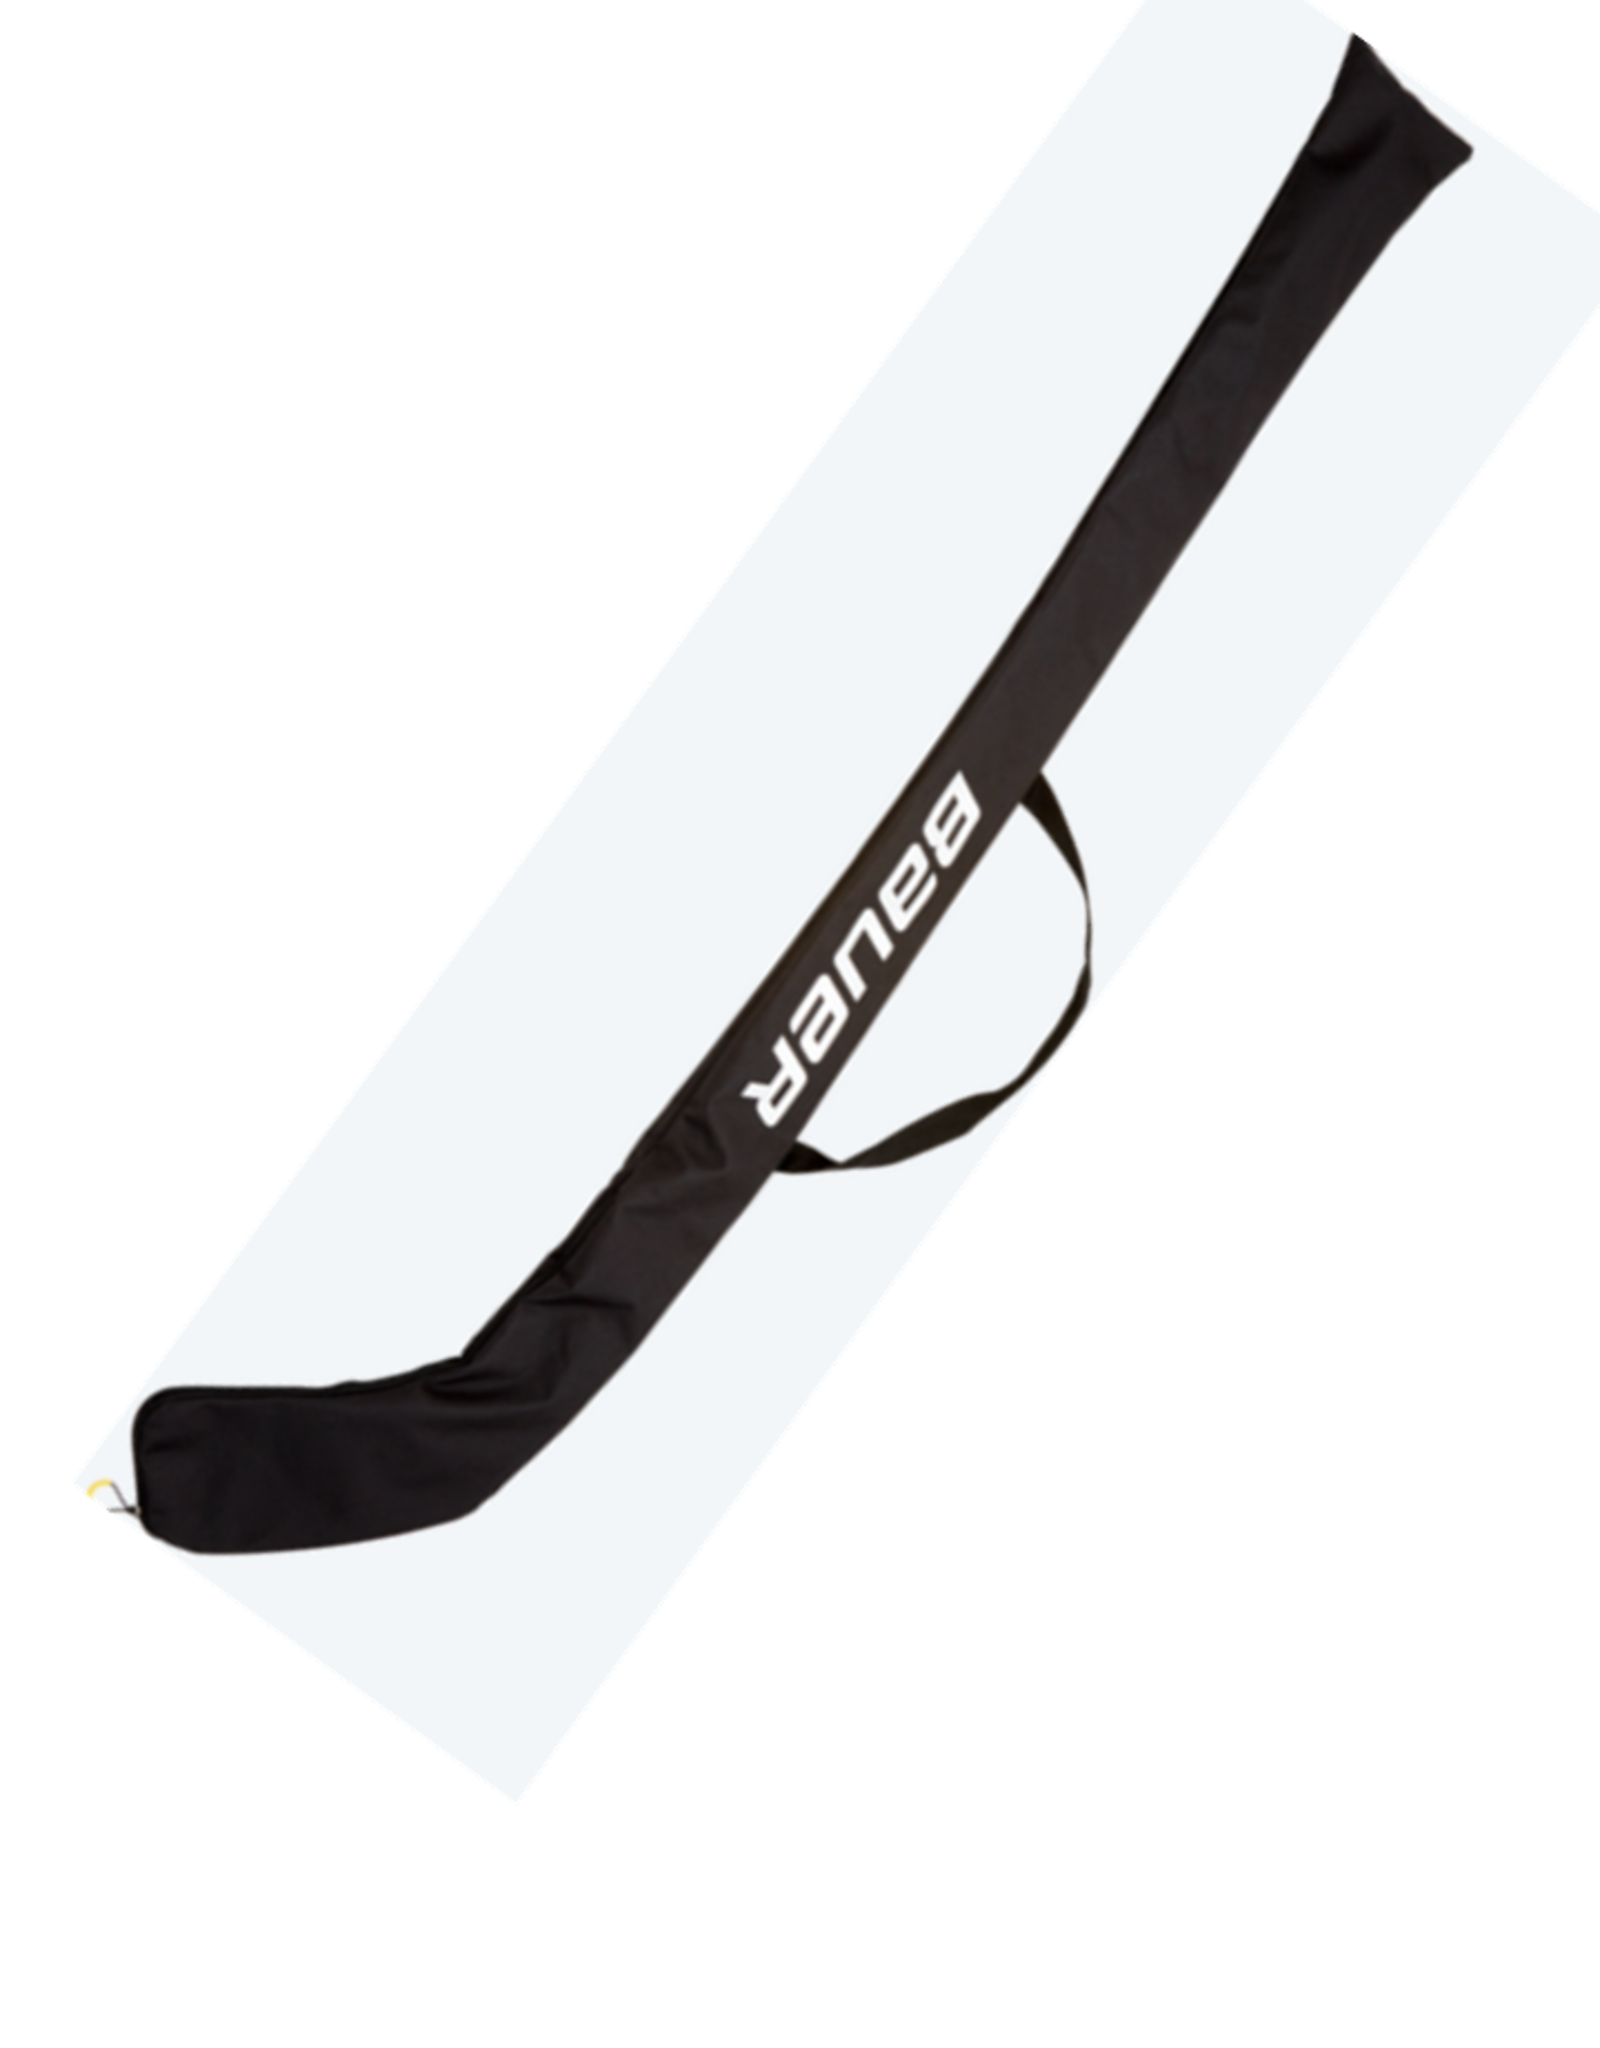 Bauer Player Stick Bag